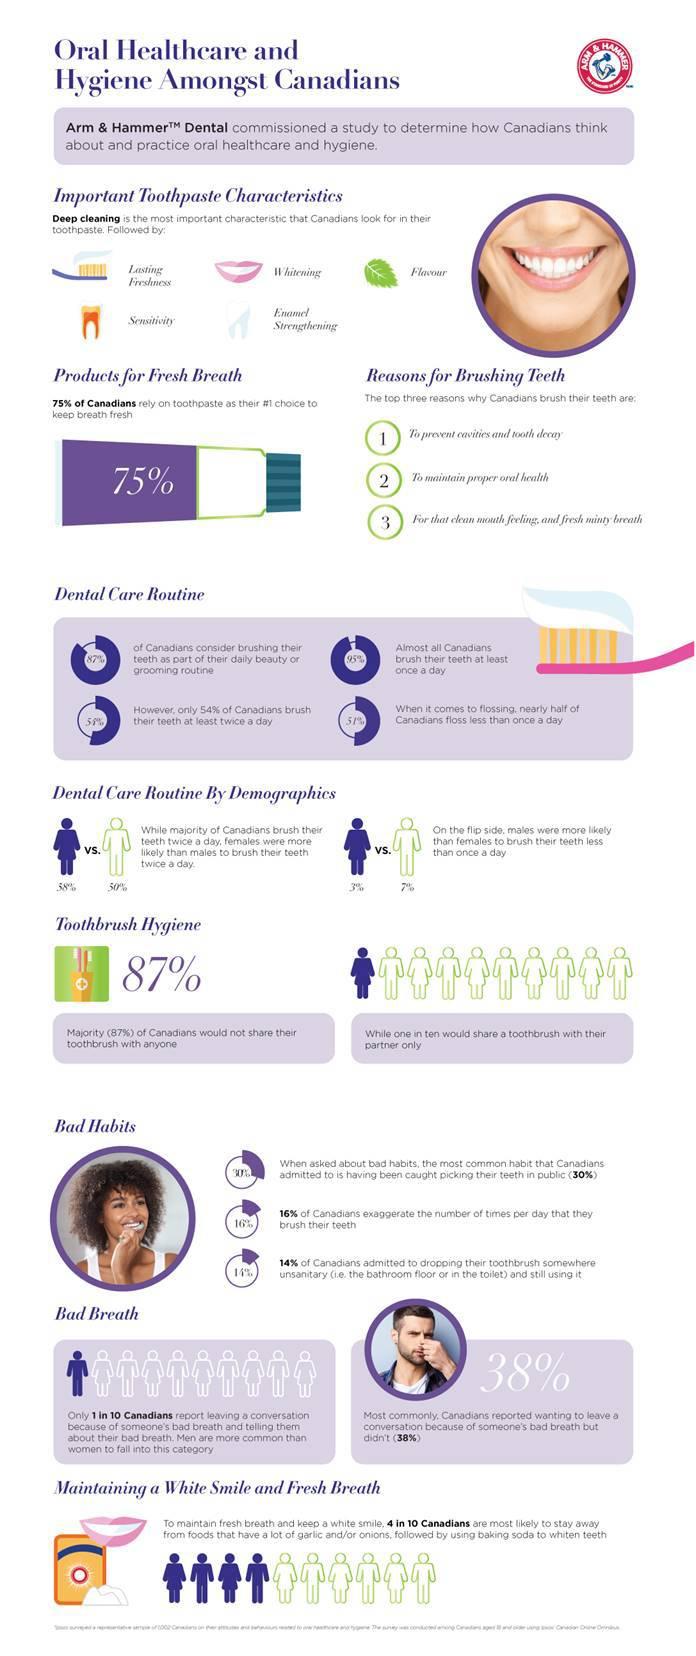 oral health habits of Canadians